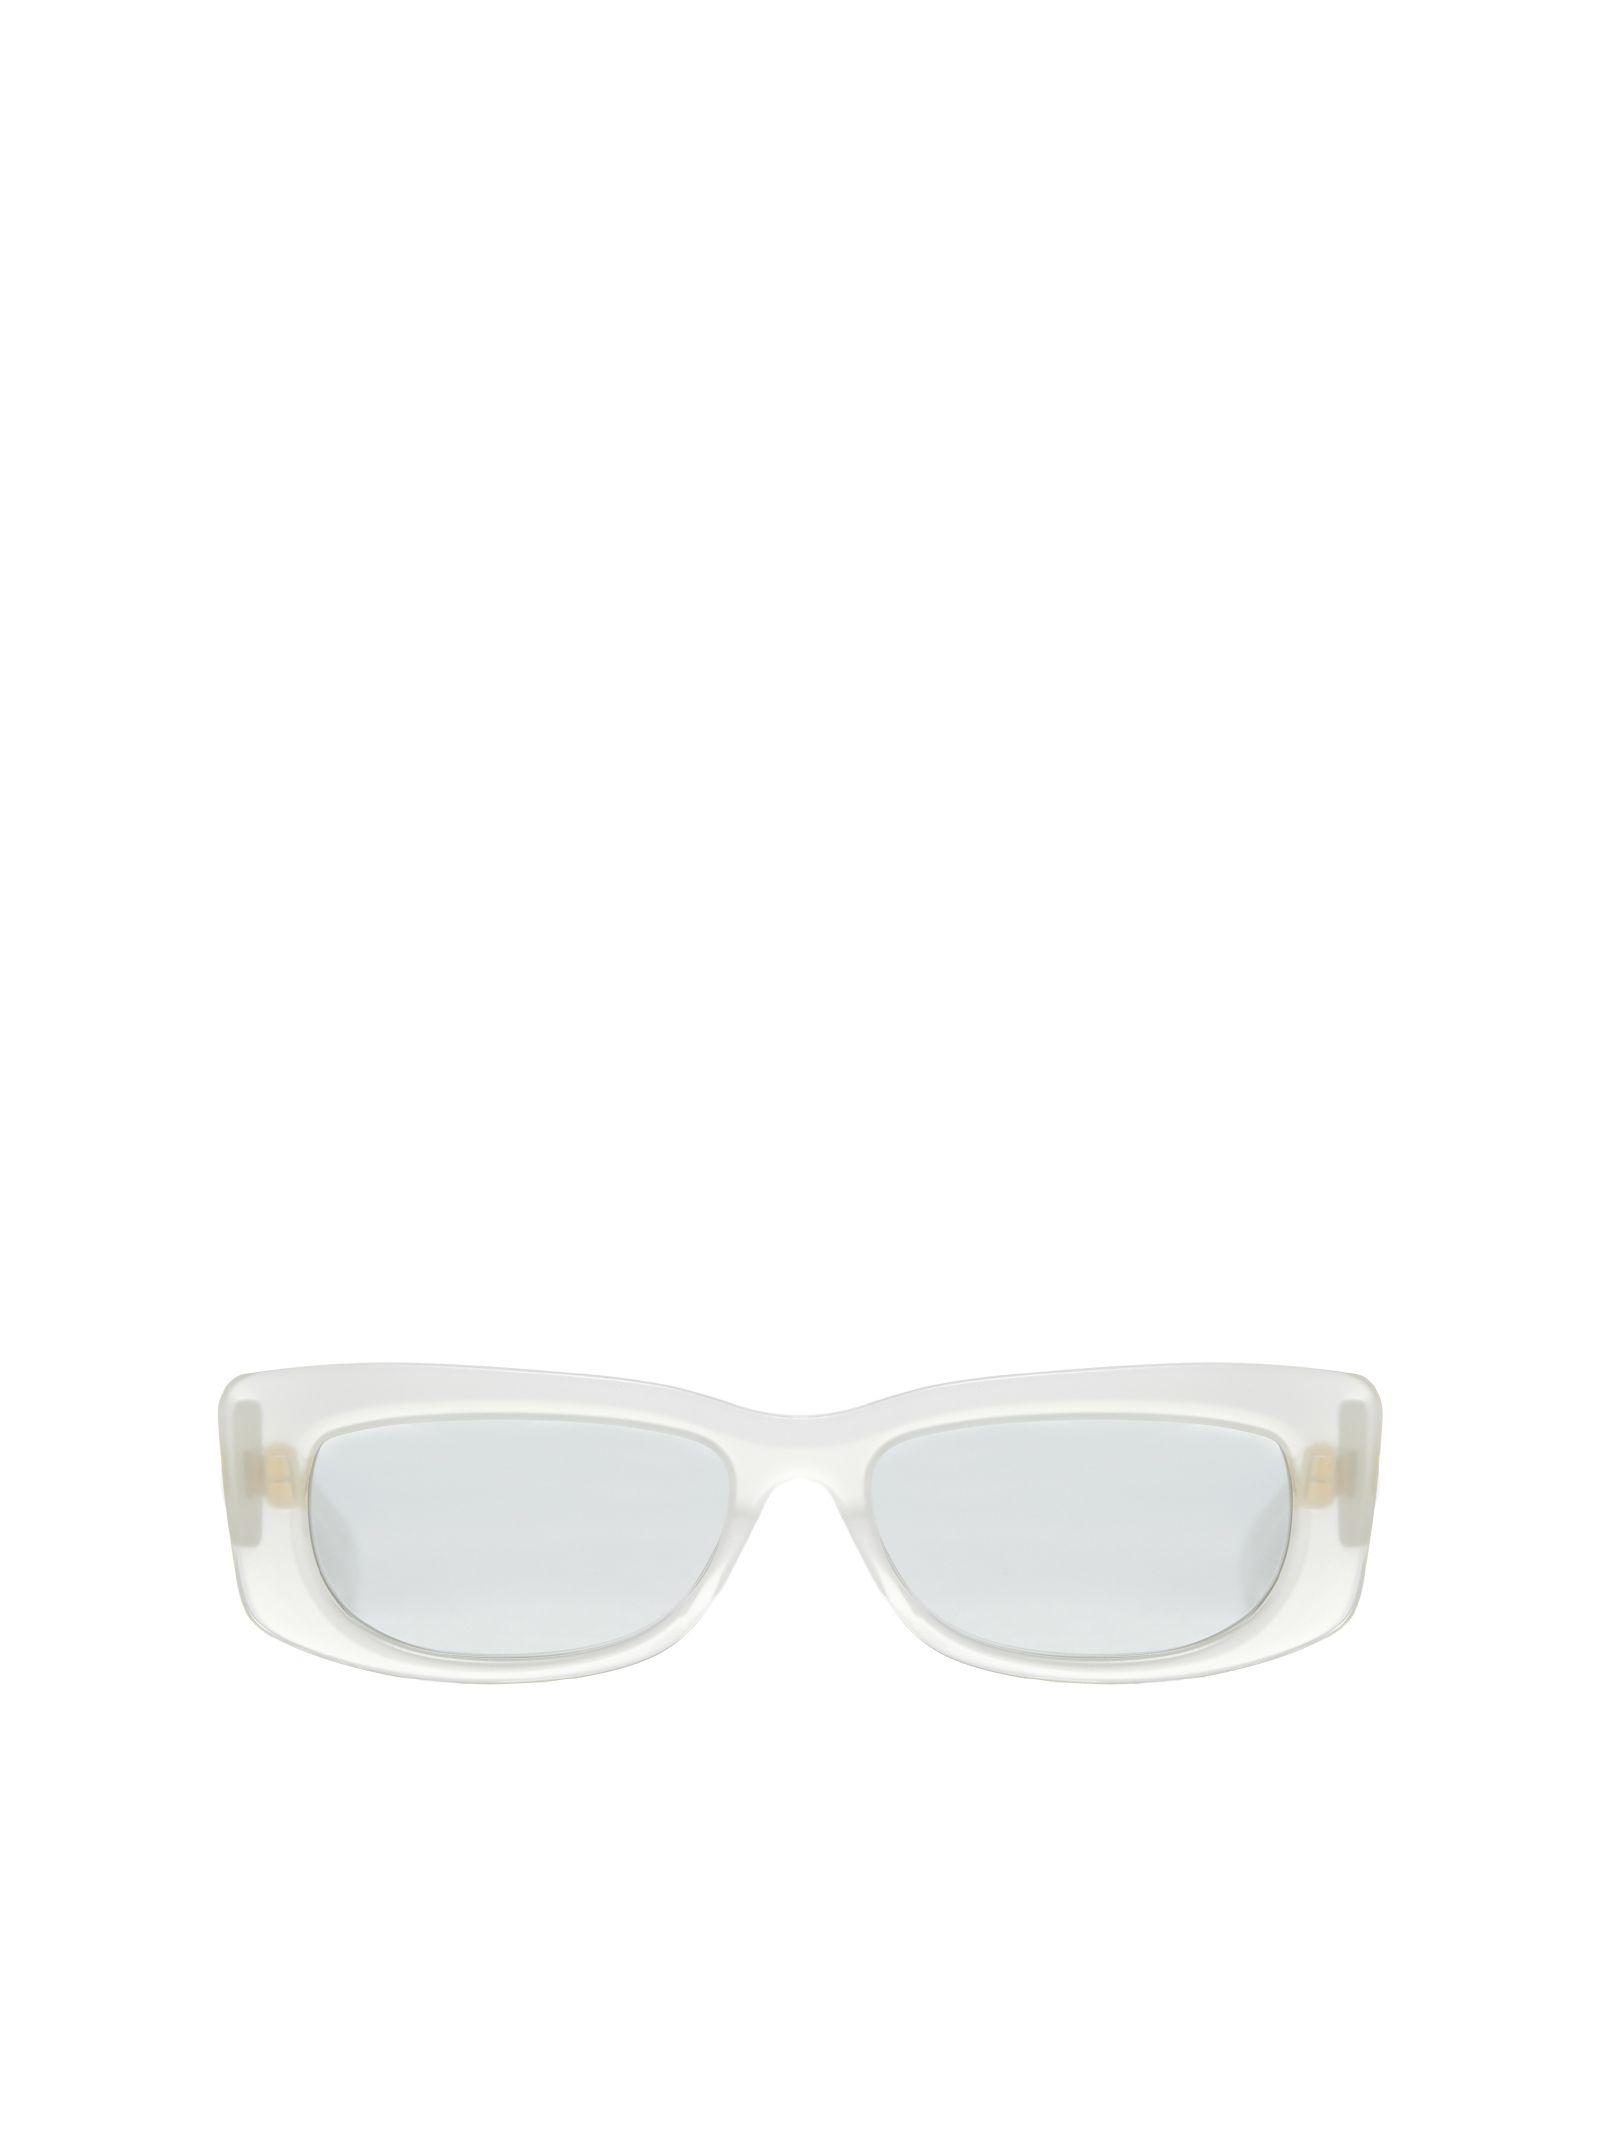 CHRISTIAN ROTH Dreesen Rectangular Sunglasses in Ghiaccio